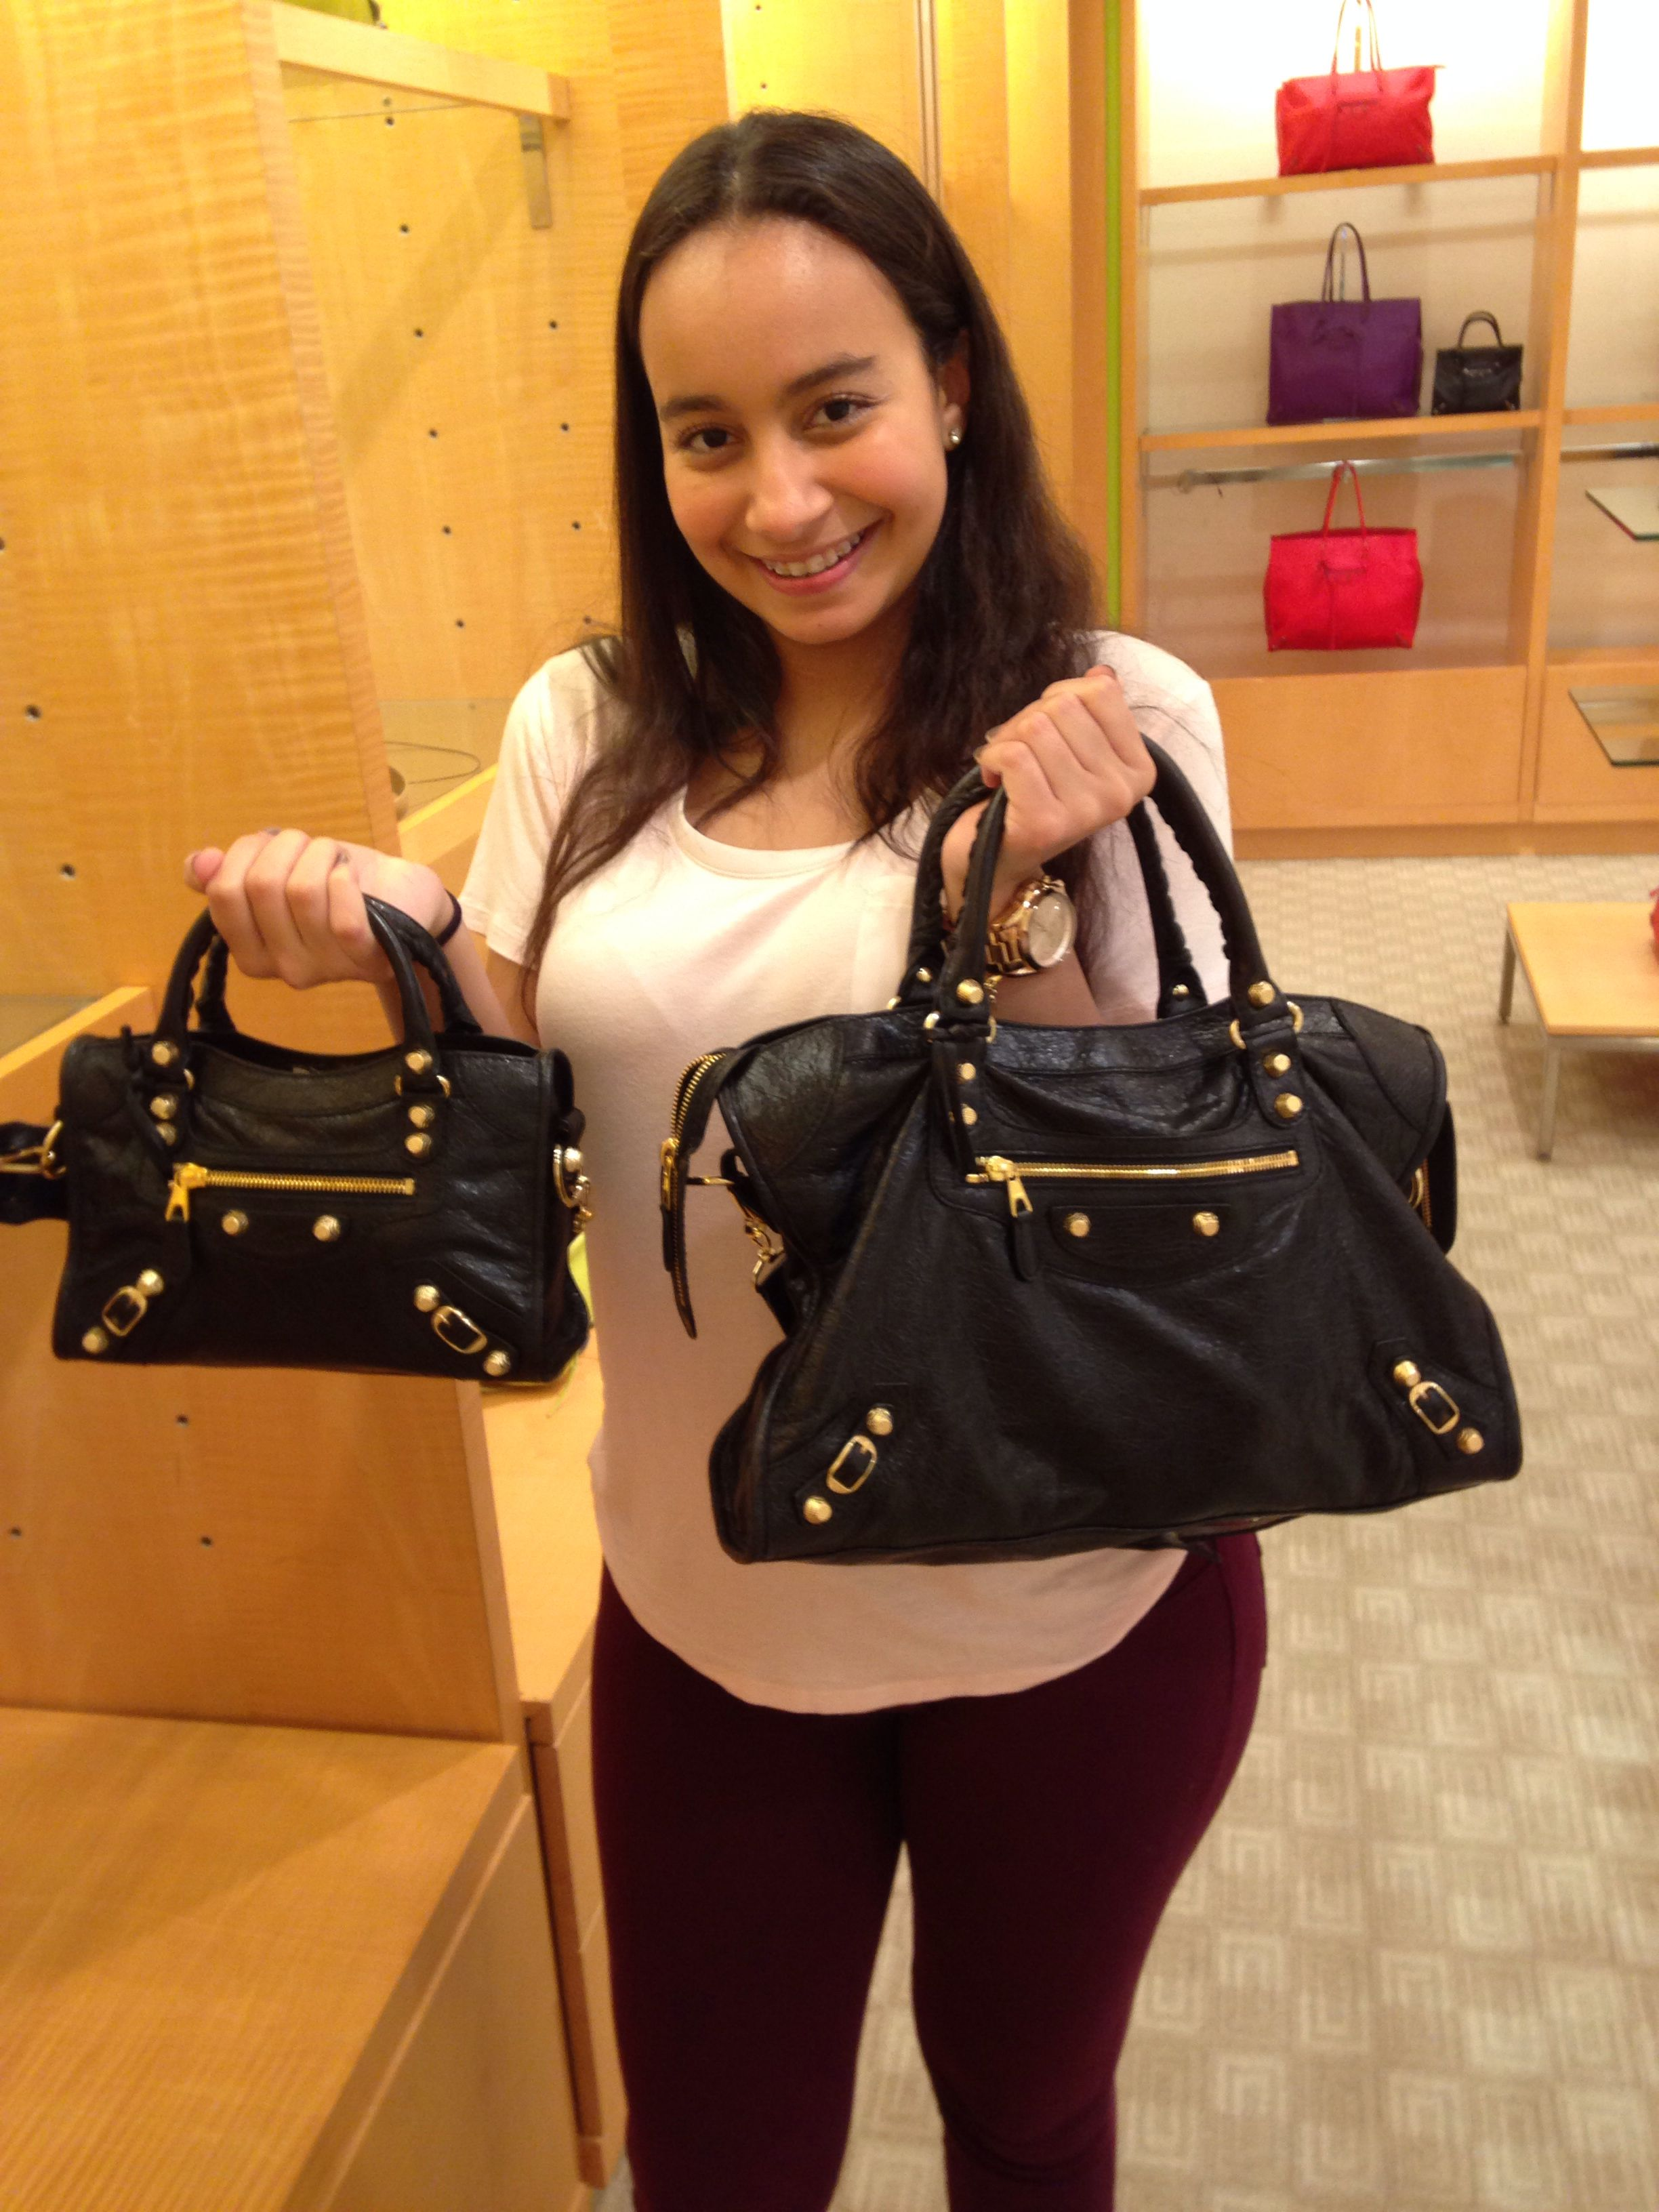 0474c2e85c On my right is my Balenciaga Giant 12 City Bag on the left is the Mini  version of my bag soooooo cute!